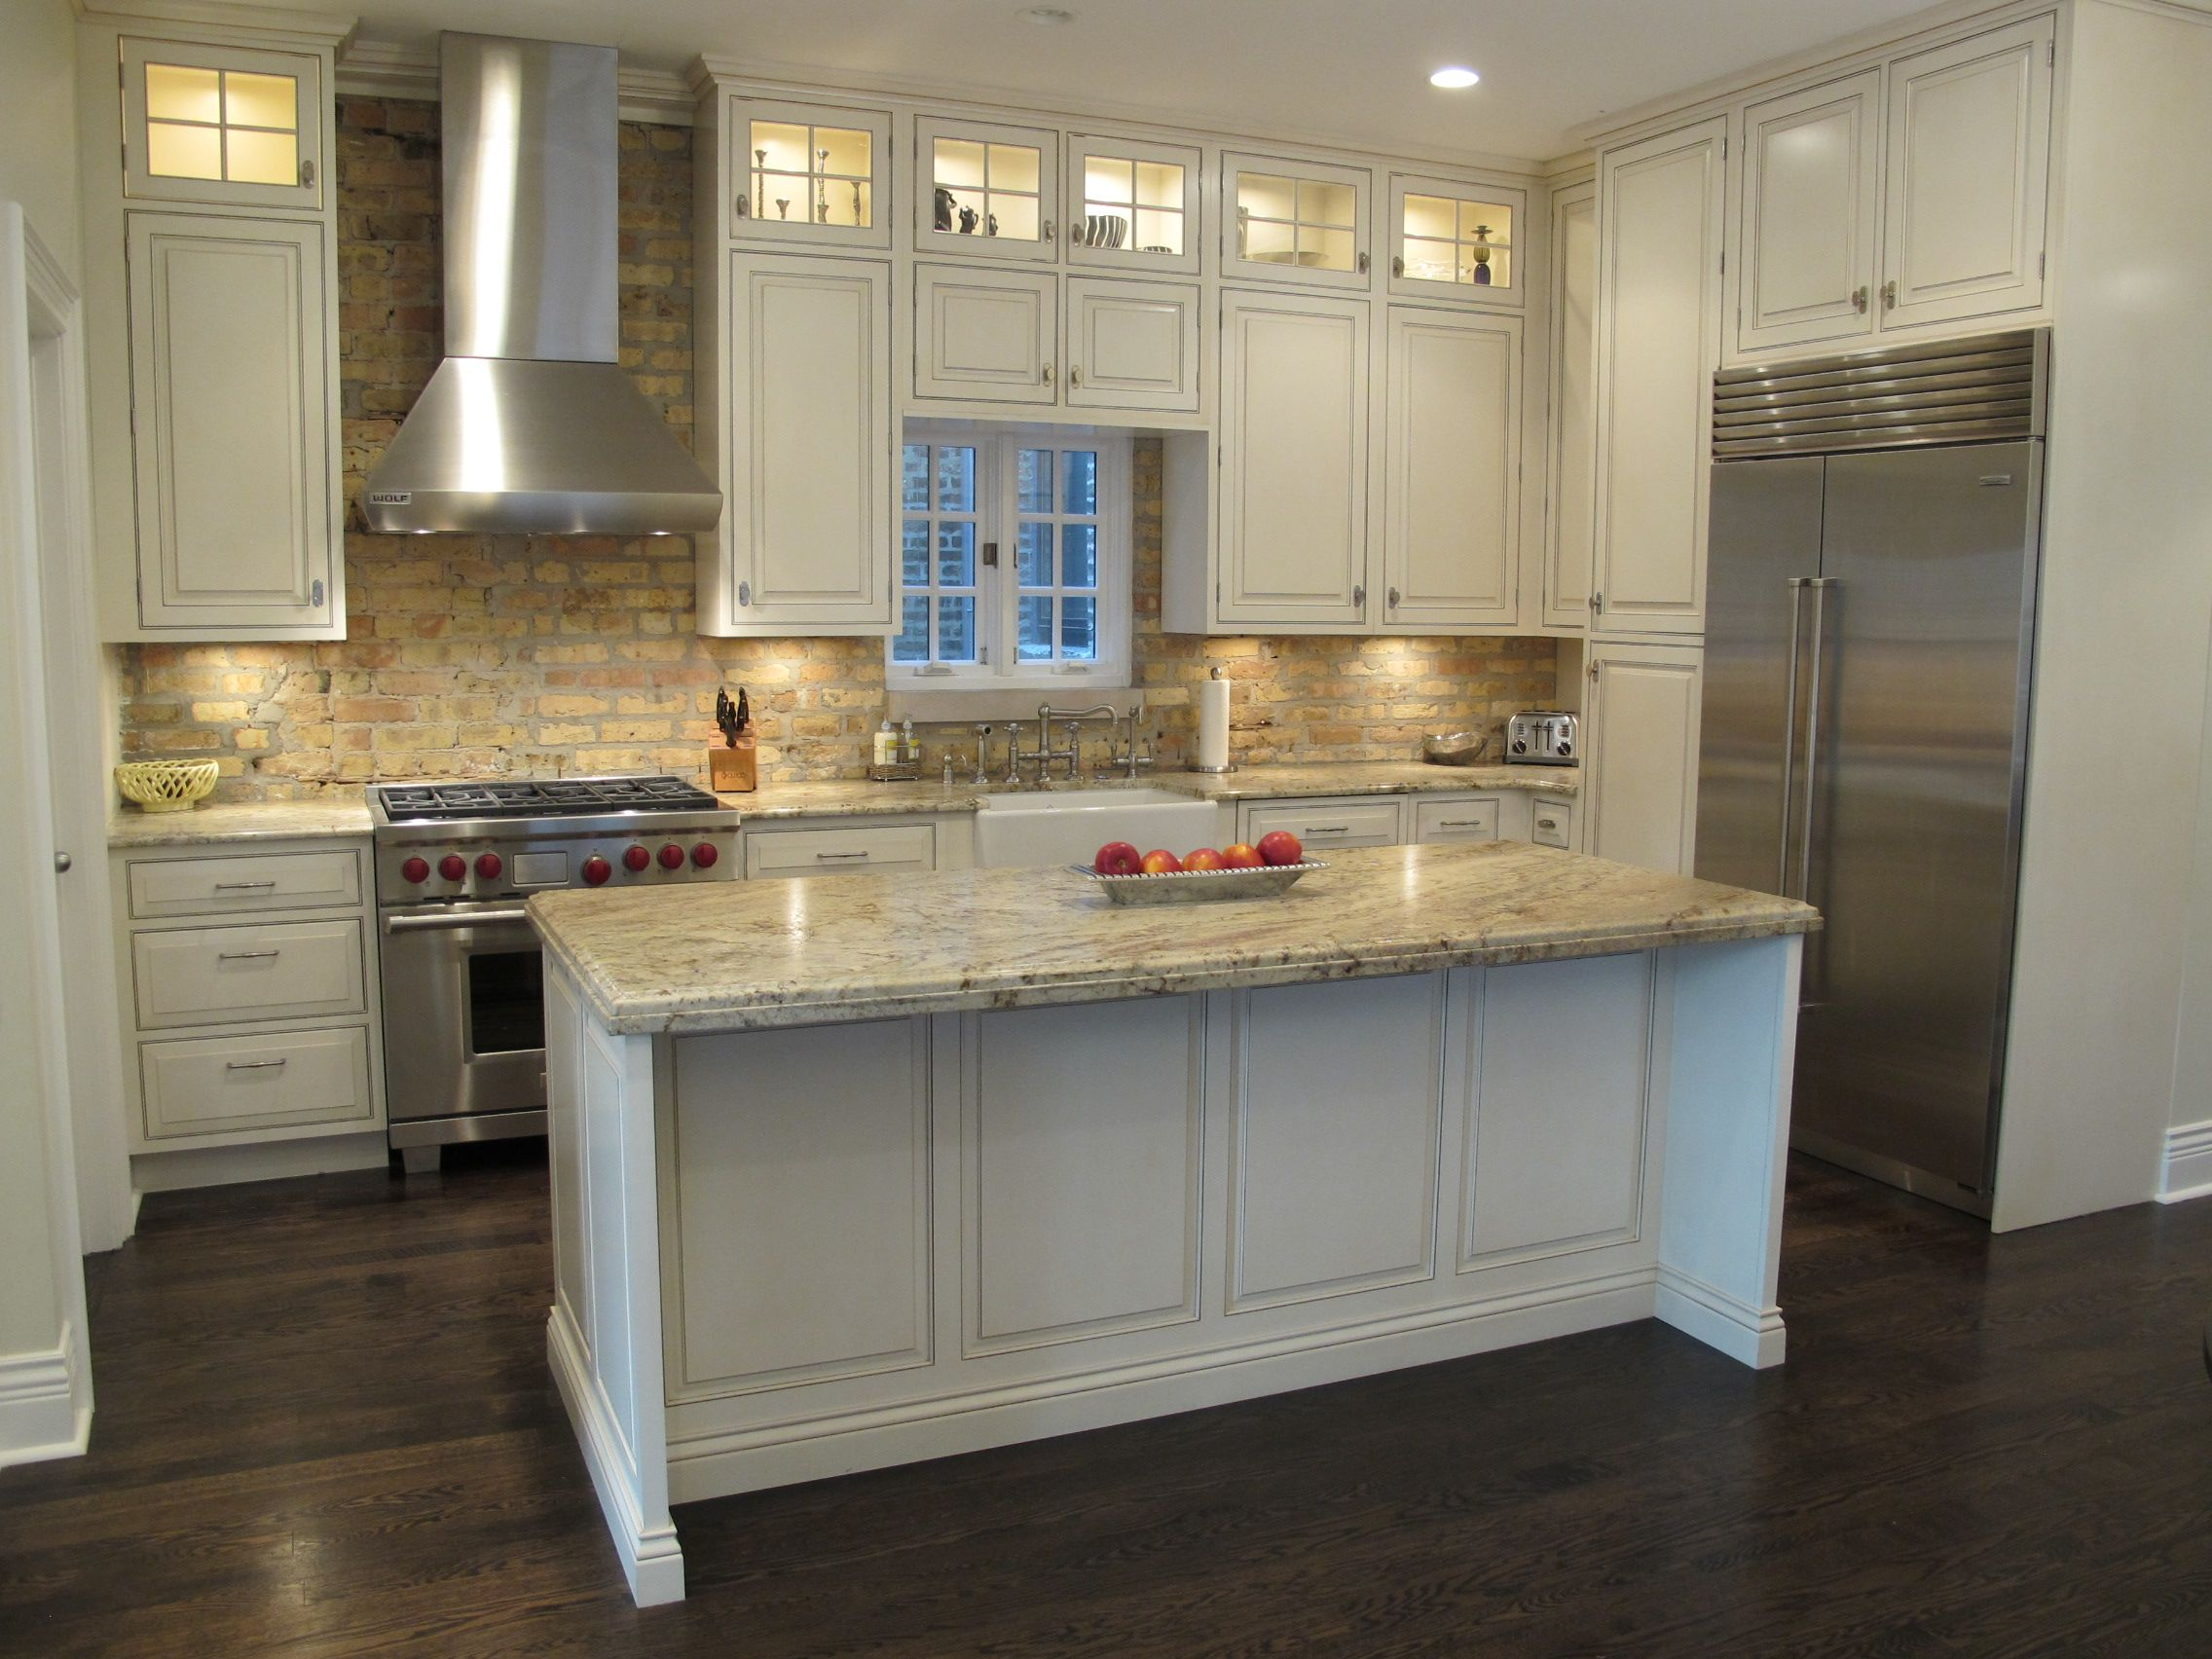 A Few Of Our Favorite Kitchen Design And Bathroom Design Projects From Dresner Design In Chicago Il Timeless Kitchen Brick Backsplash Kitchen Kitchen Remodel